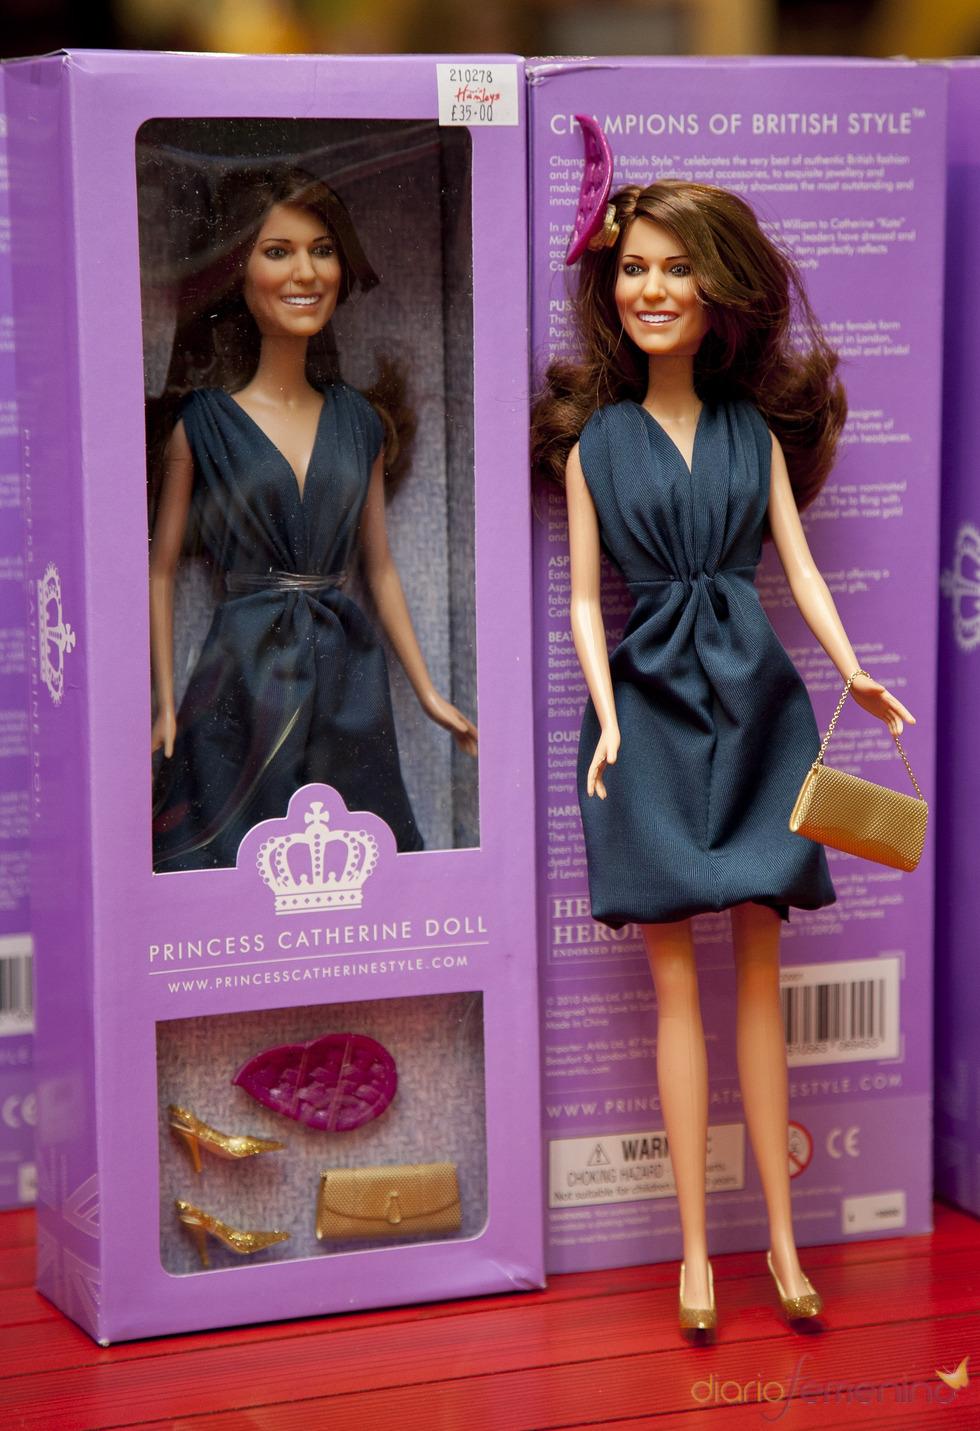 Kate Middleton ya tiene su muñeca Princesa Catherine